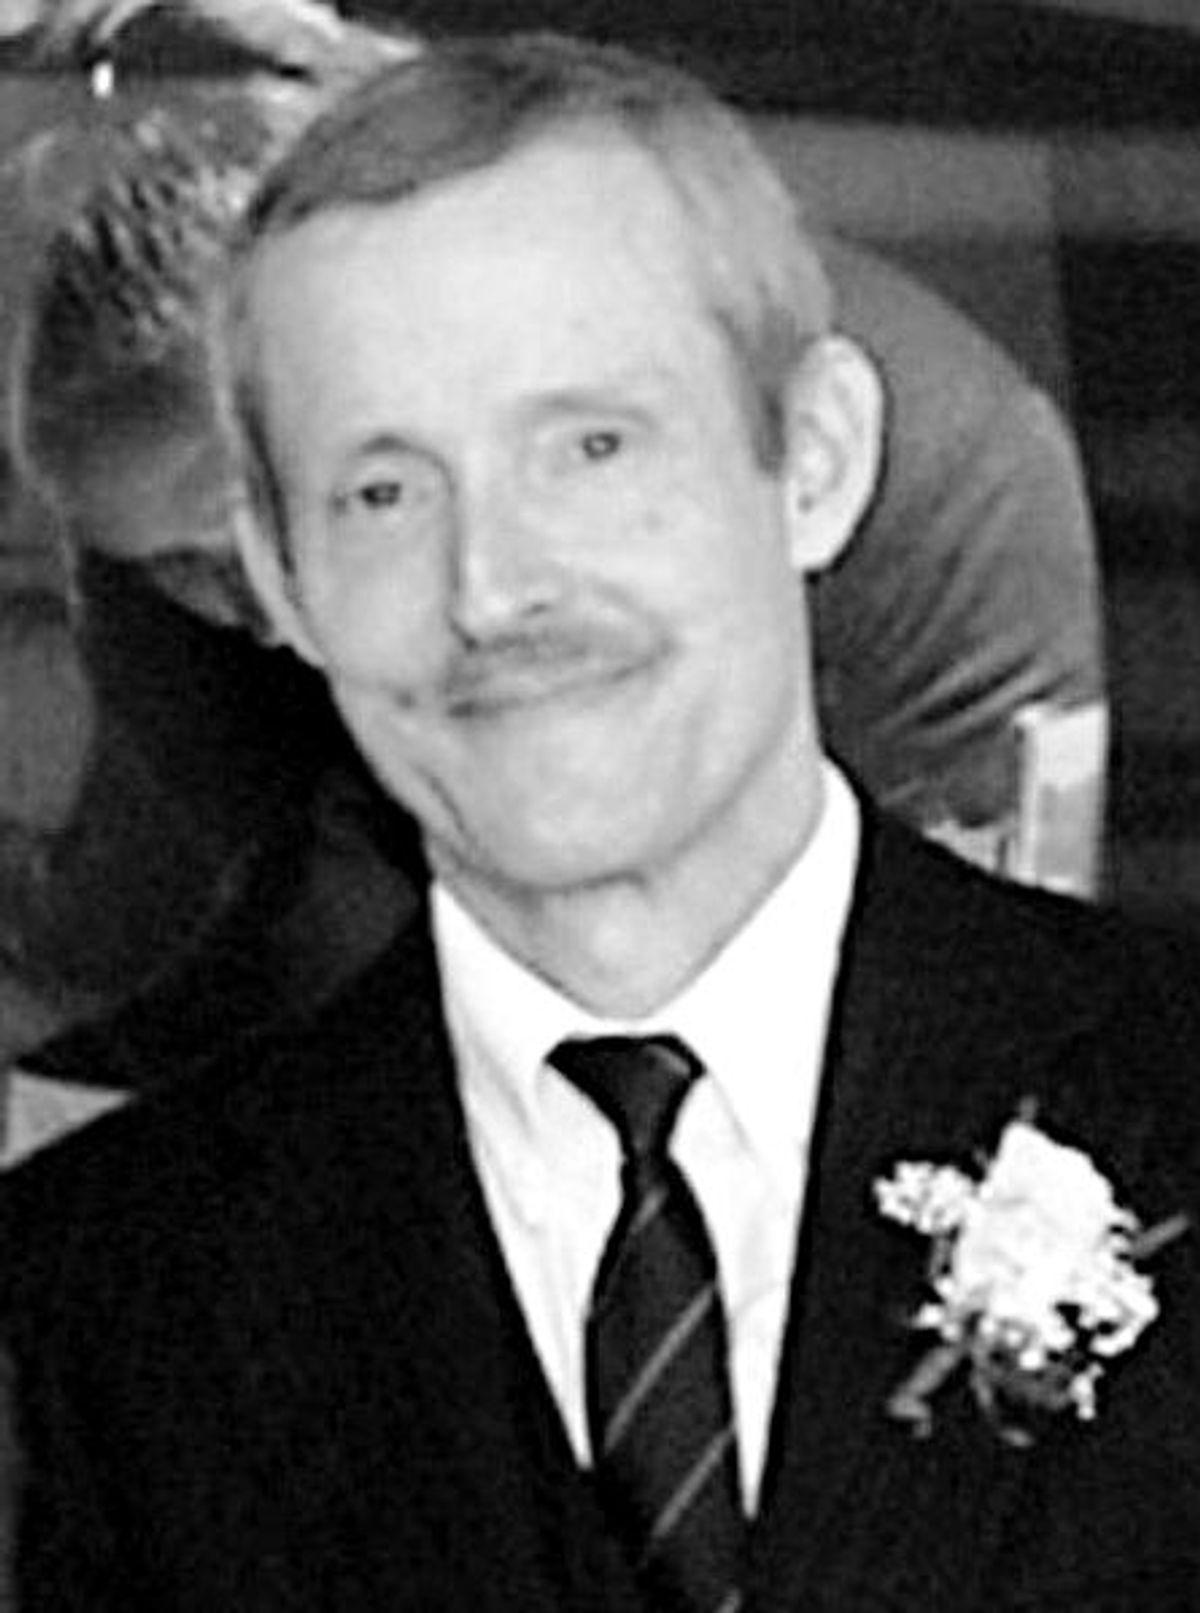 Bruce Ivins in 2003